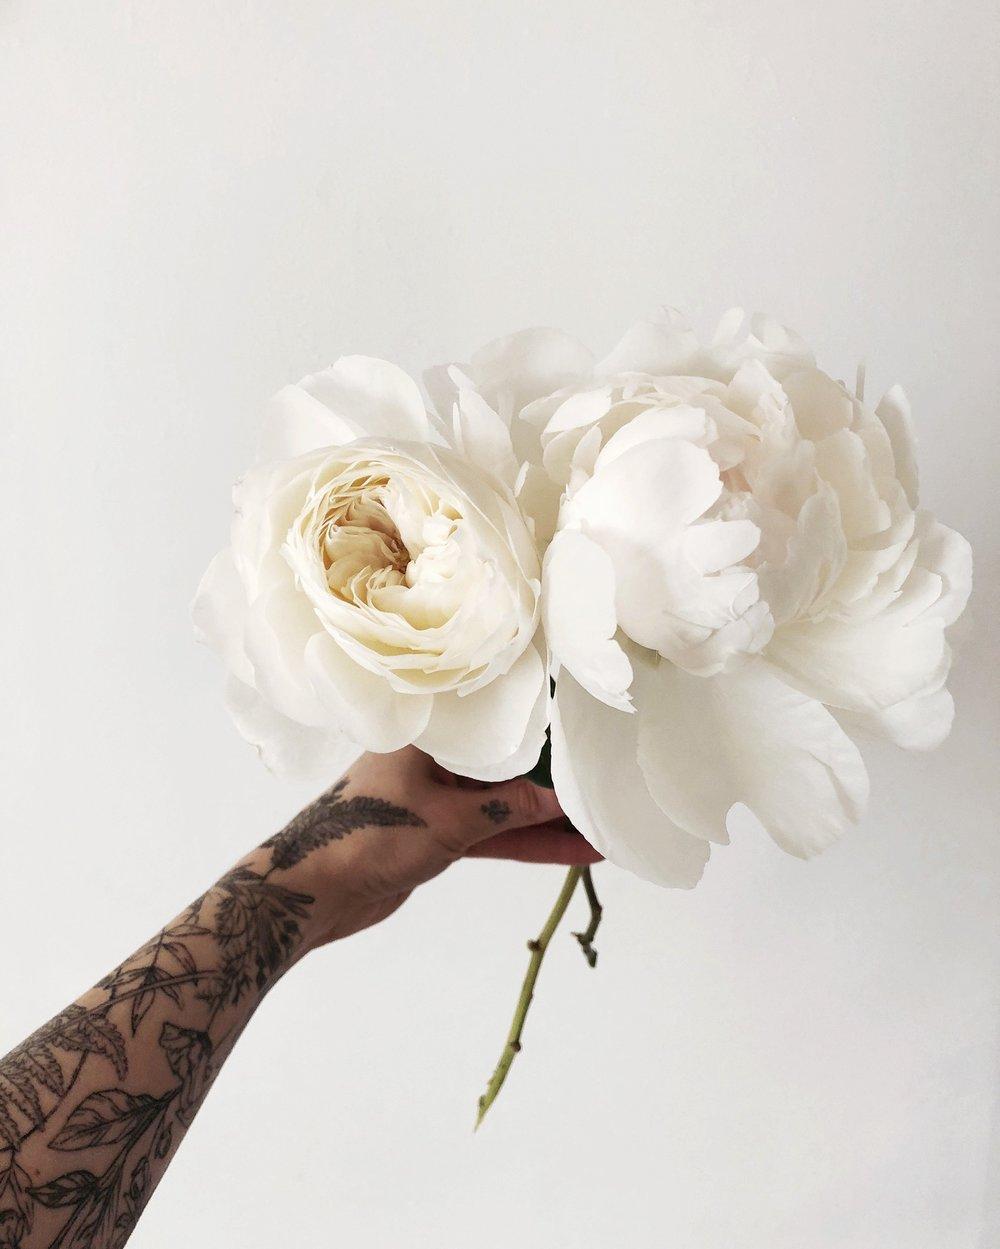 garden rose vs. peony